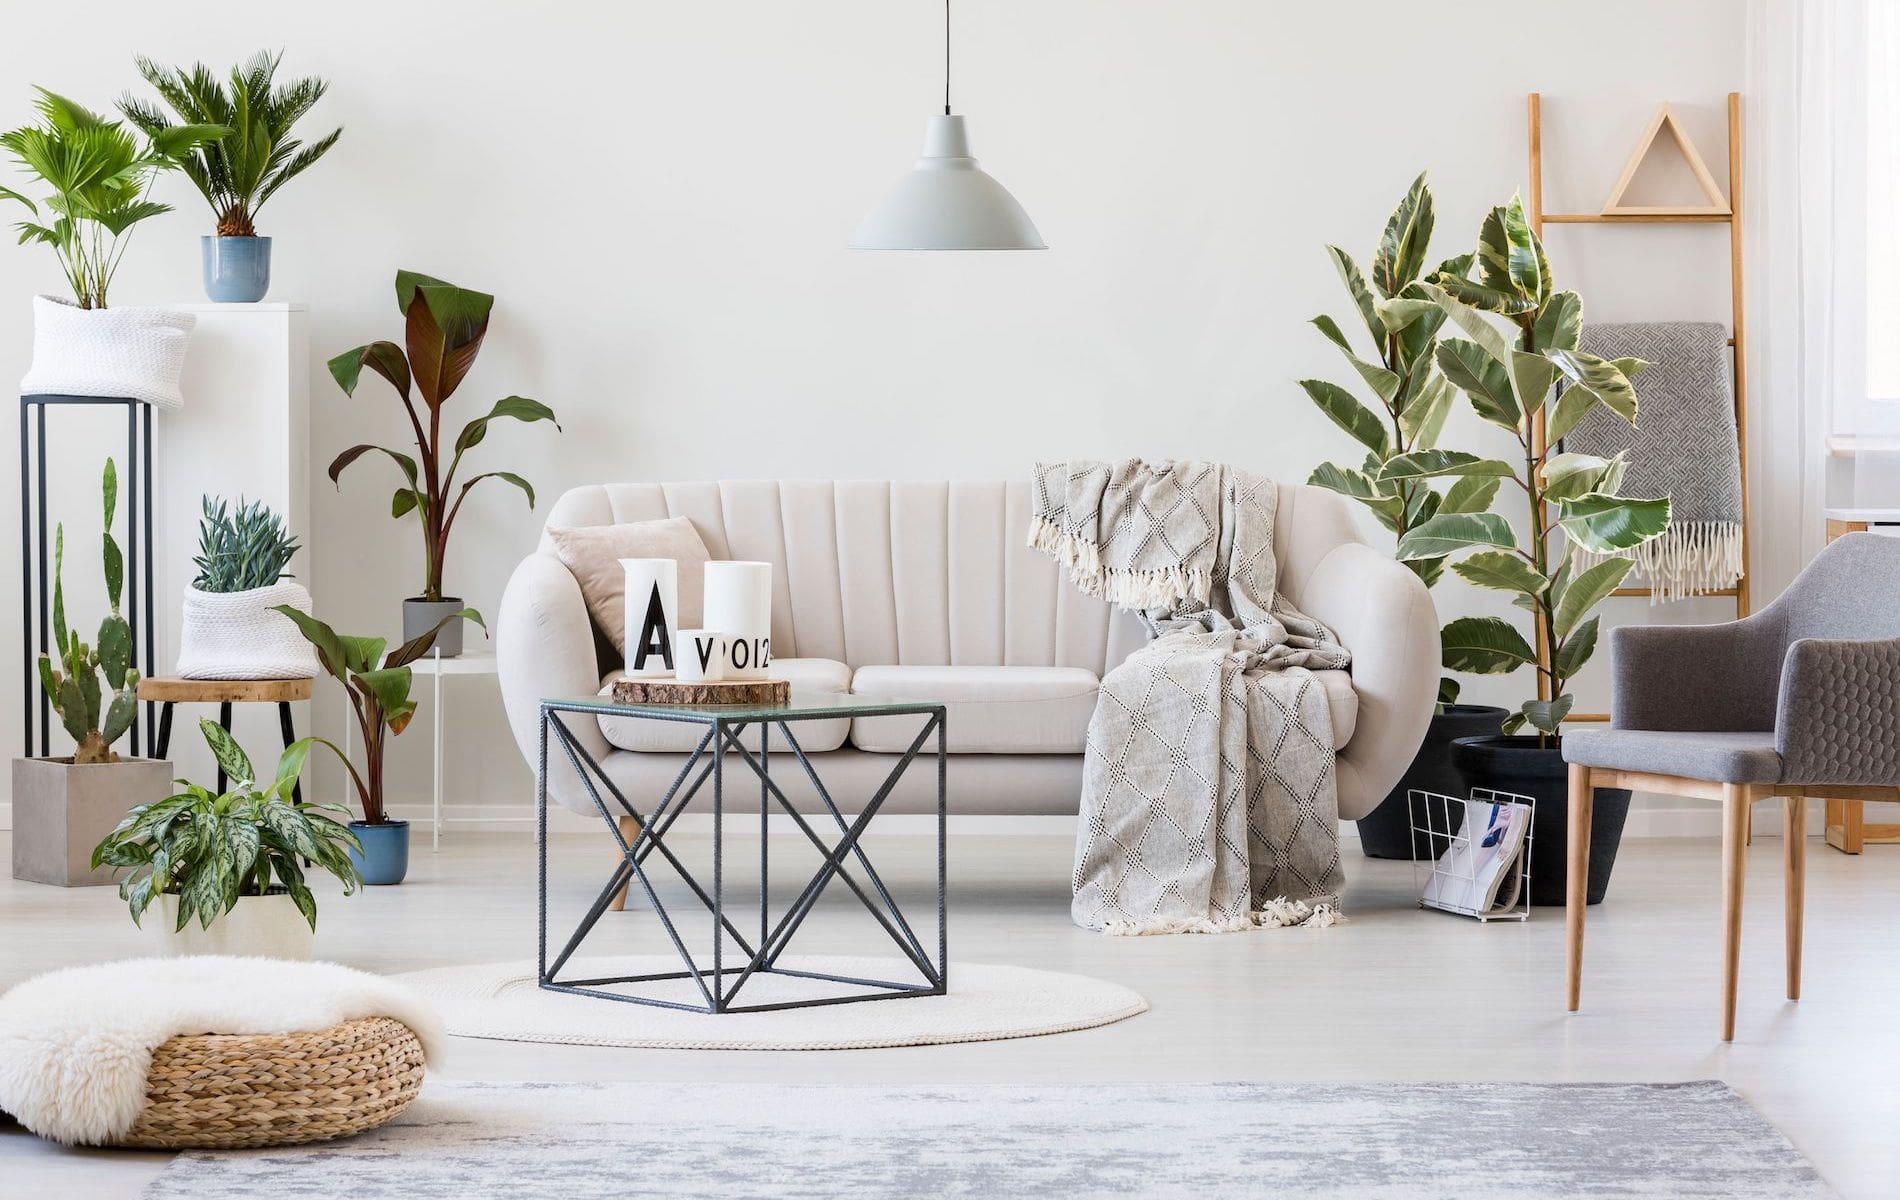 VIE Magazine, The Idea Boutique, Five Air-Purifying Plants, Five Air-Purifying Plants to Keep You and Your Home Healthy